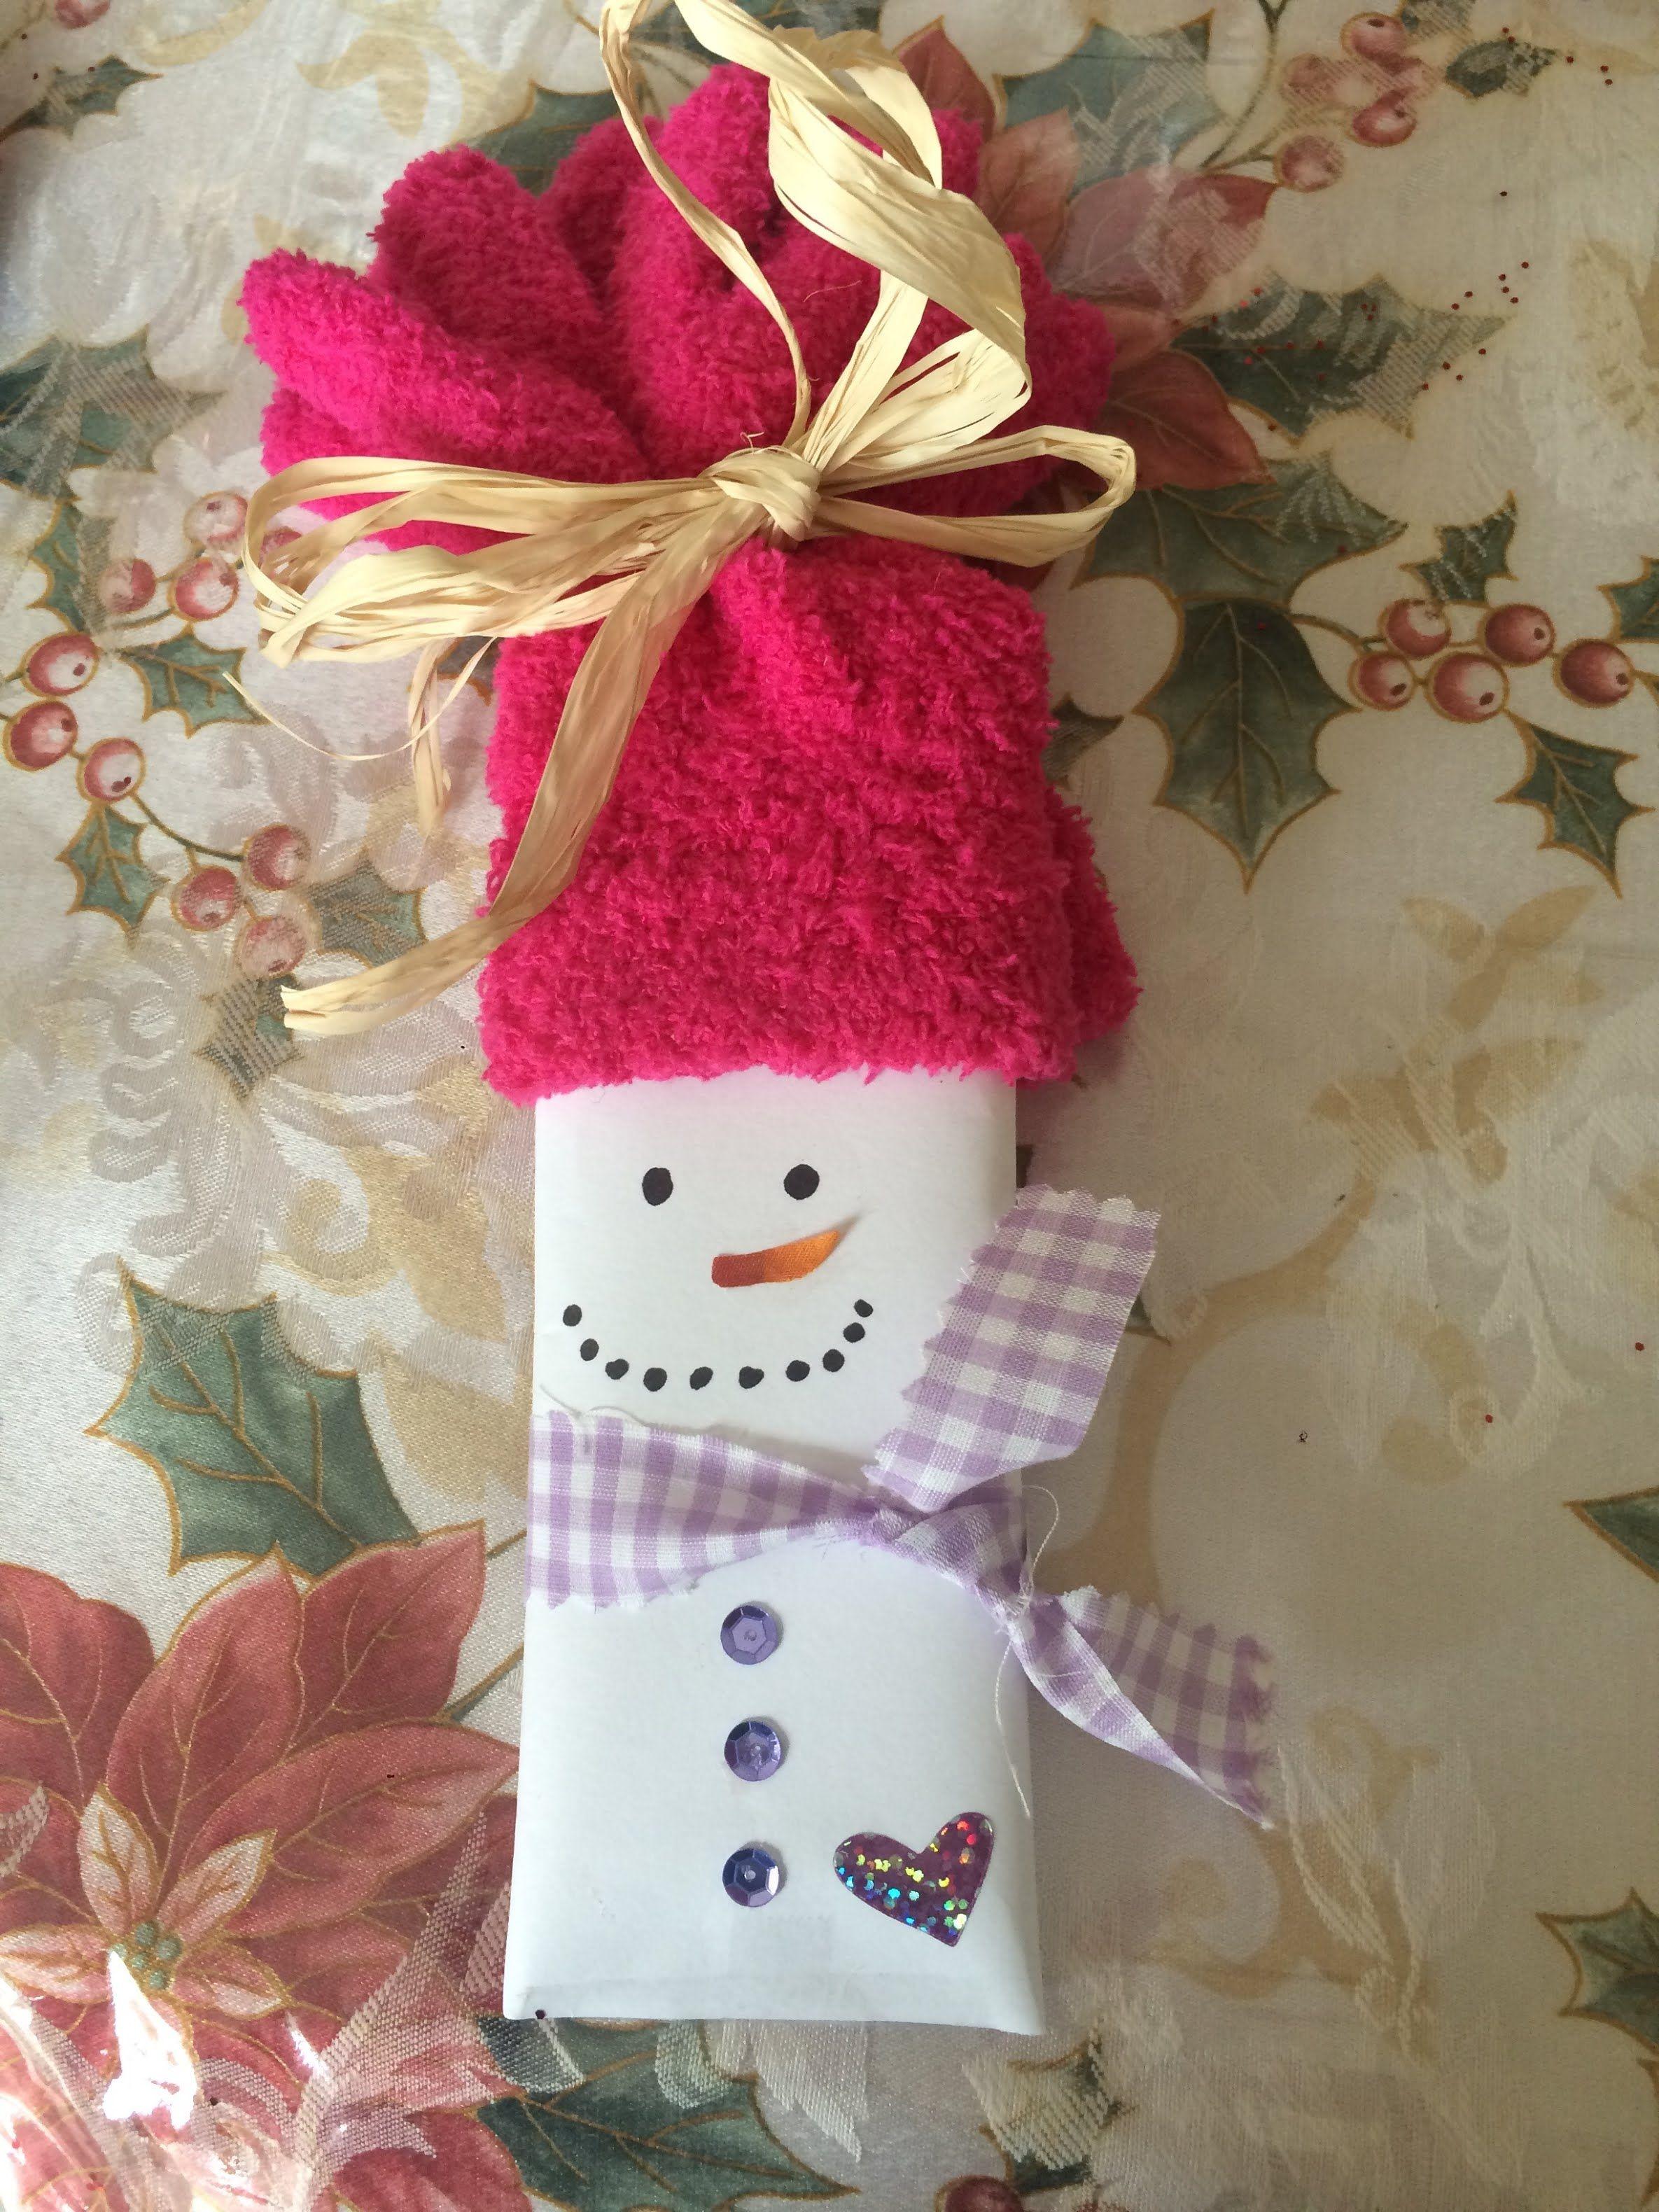 25 Days of Christmas Crafts Day 8 Dollar Tree snowmen